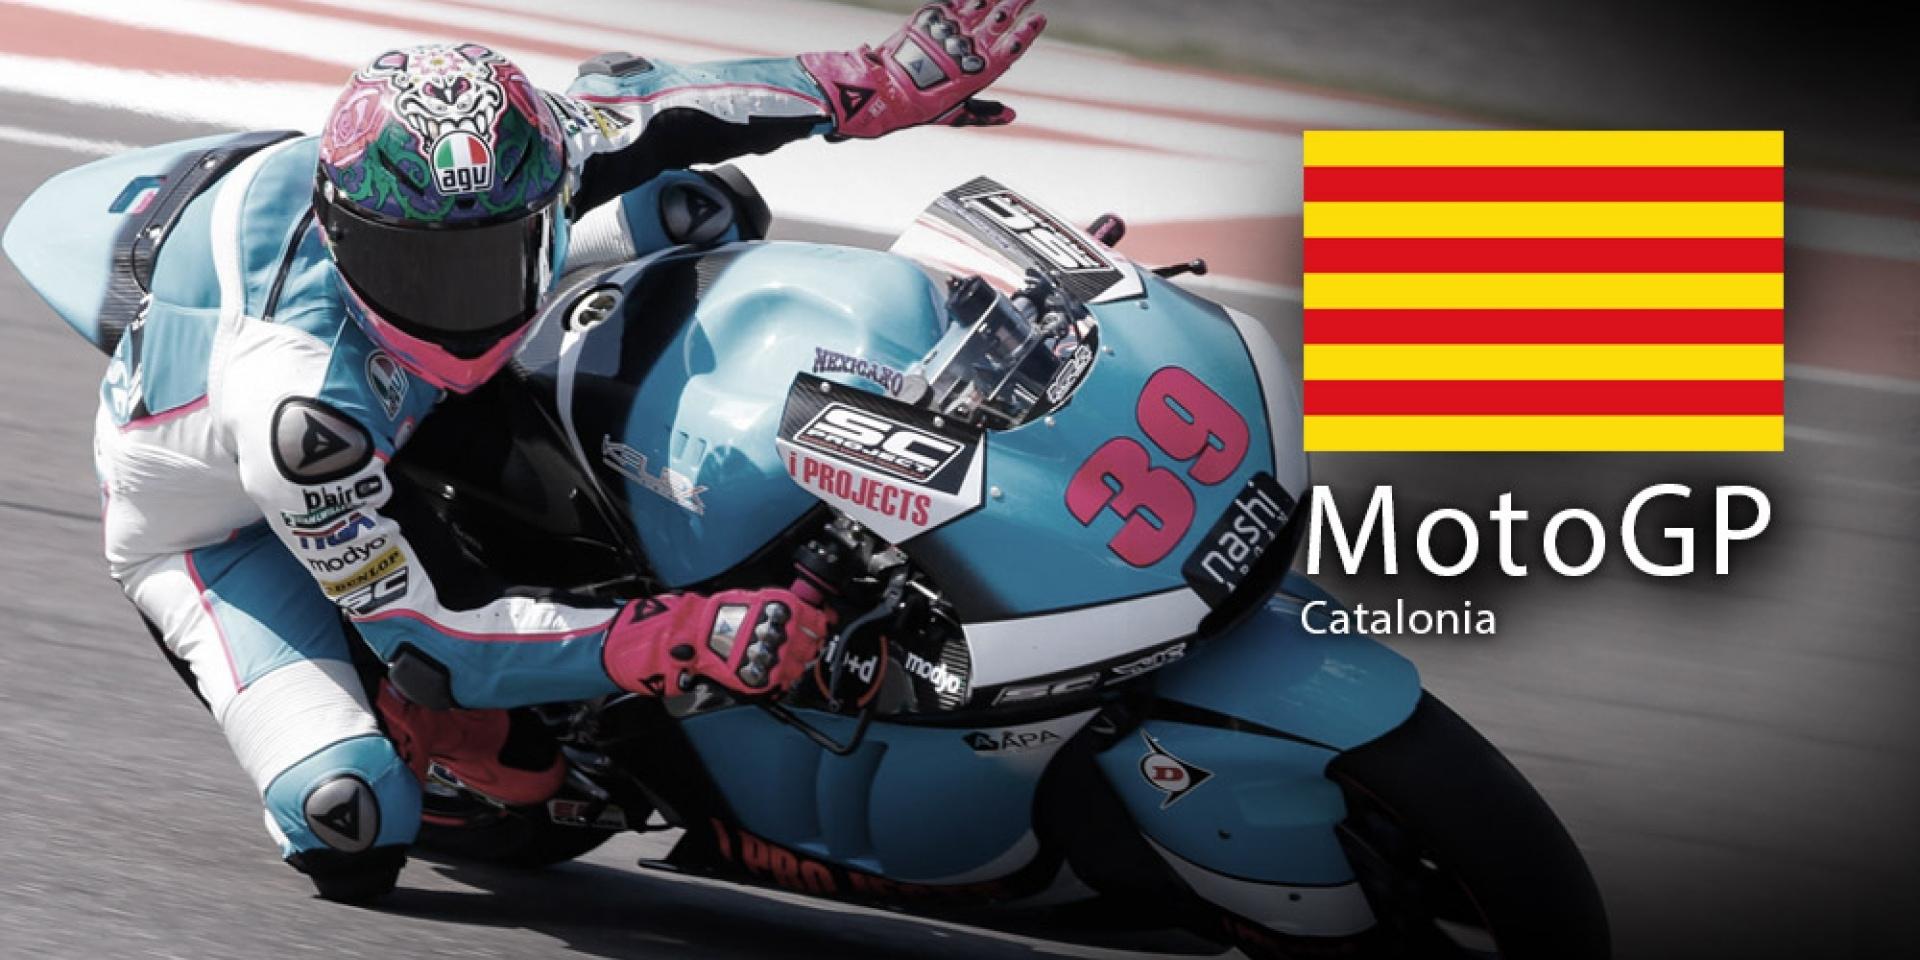 MotoGP 第7站  加泰隆尼亞站  轉播時間